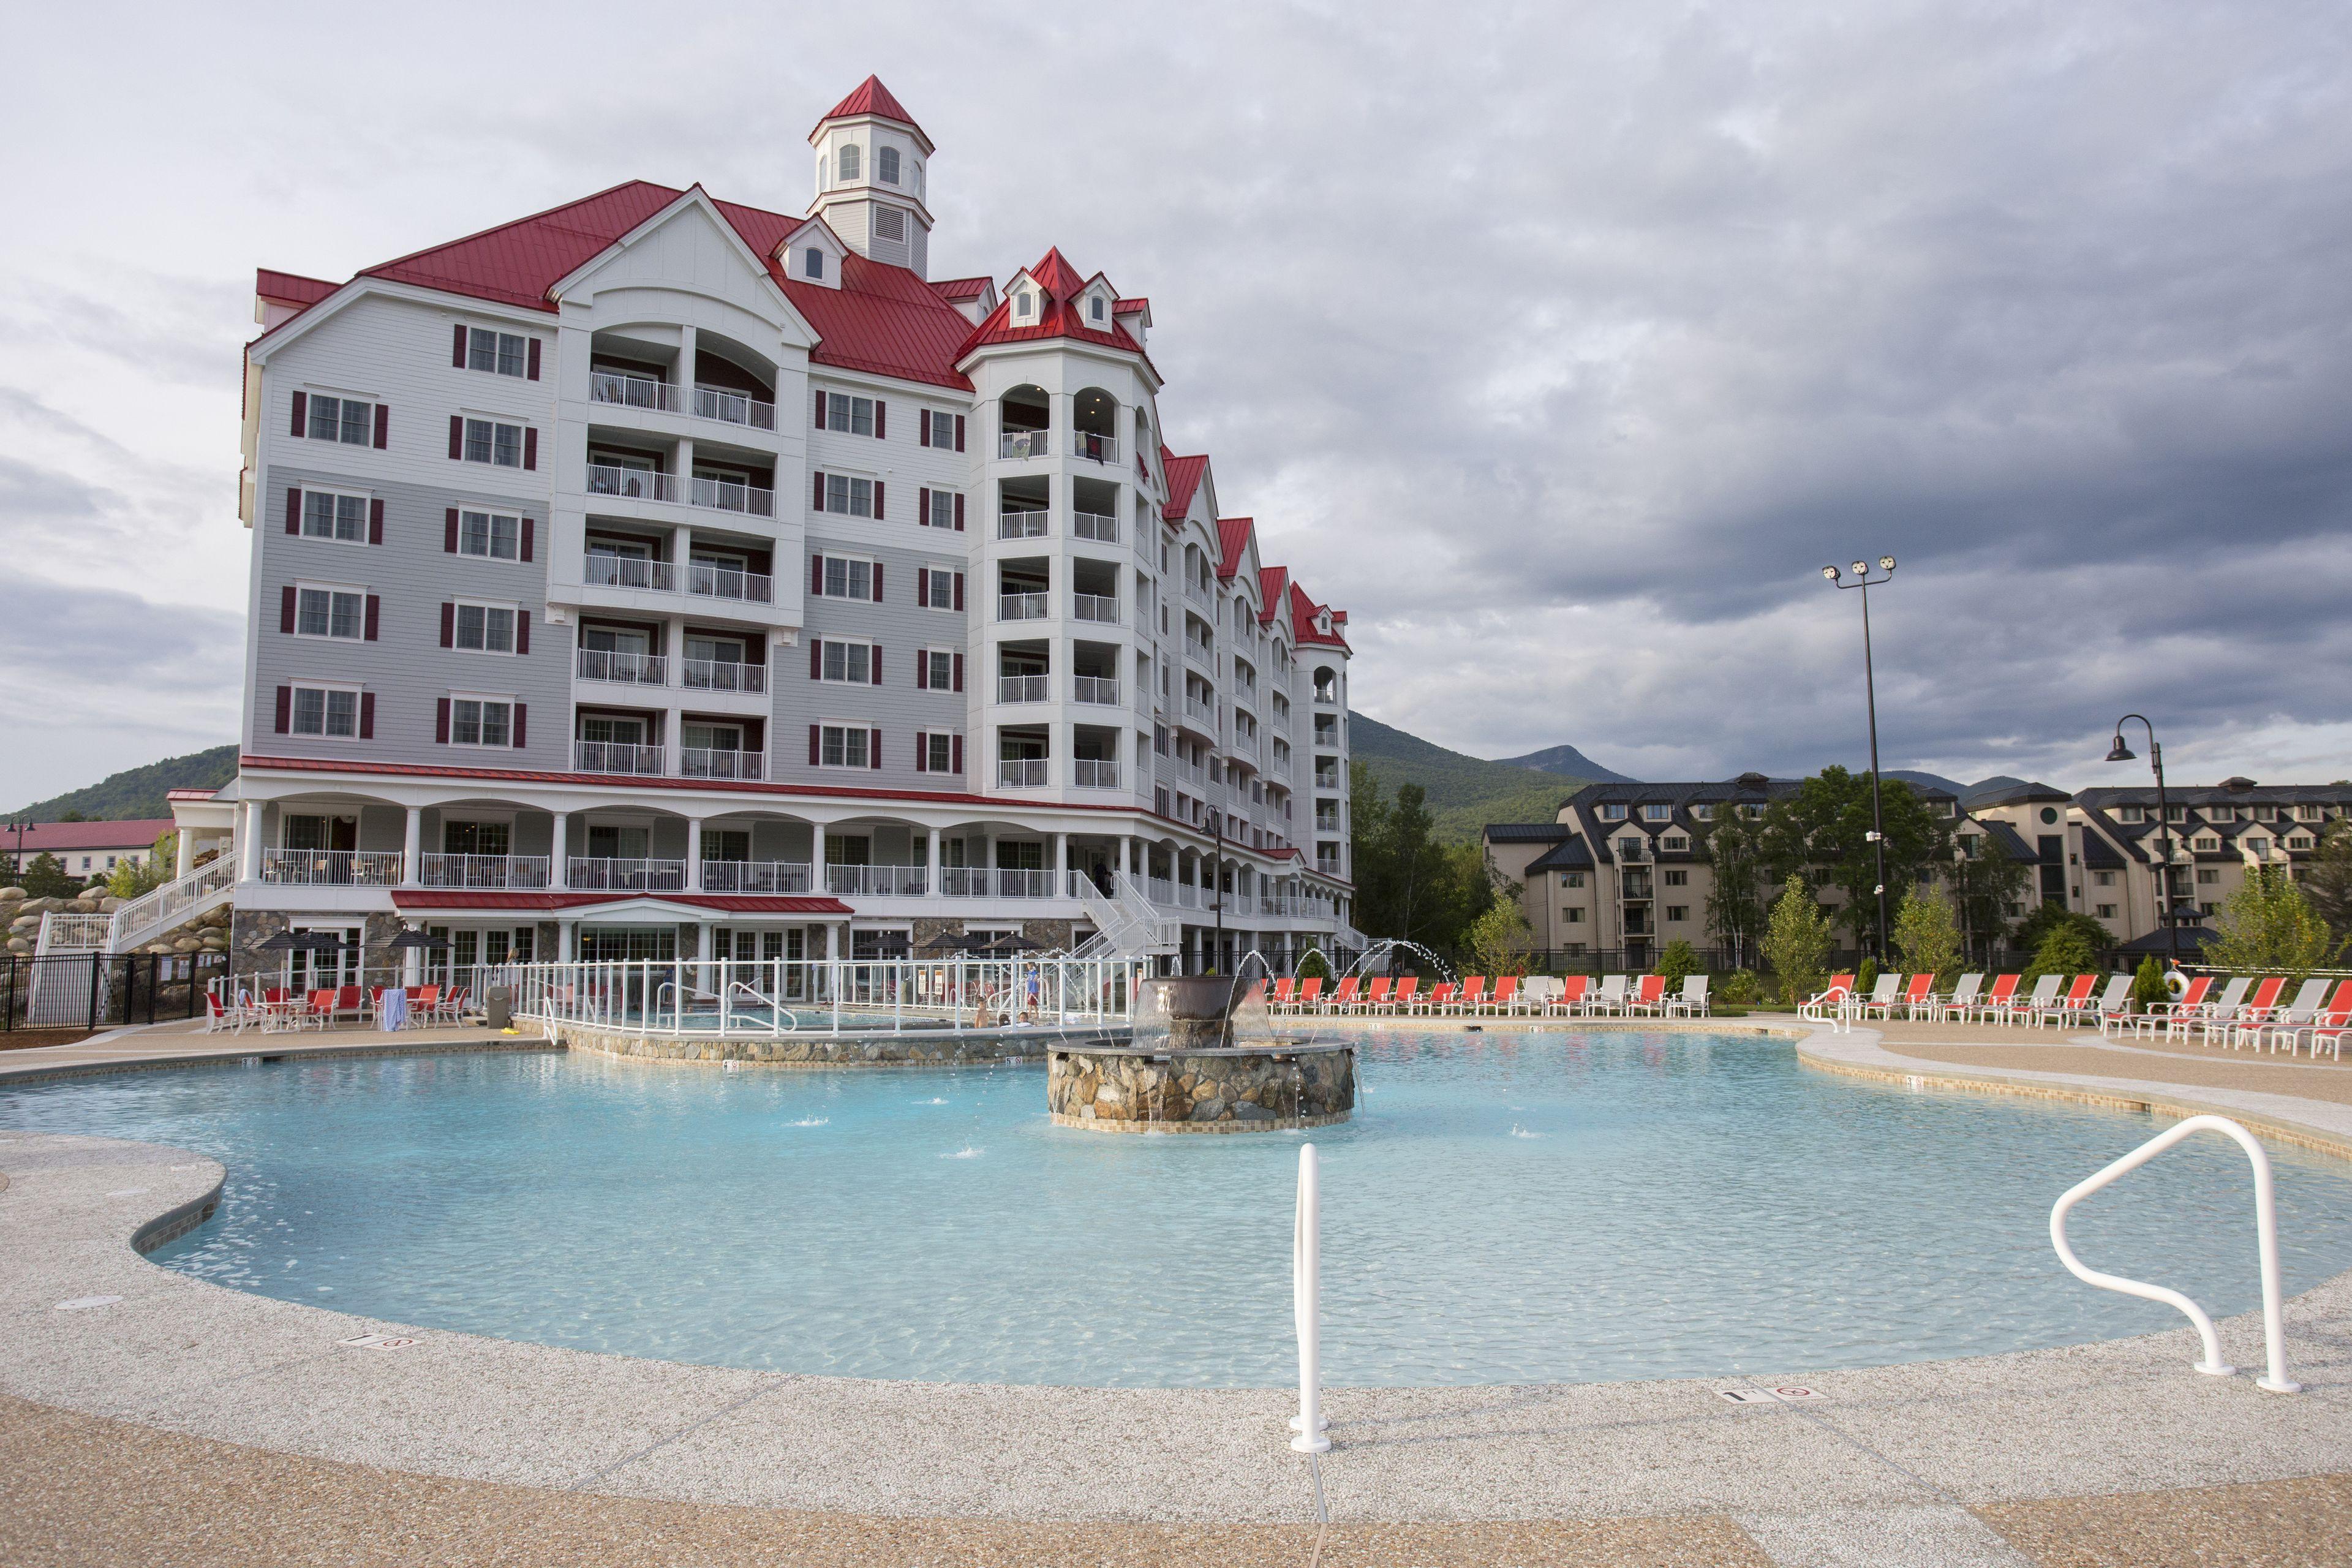 Courtesy of RiverWalk Resort / Expedia